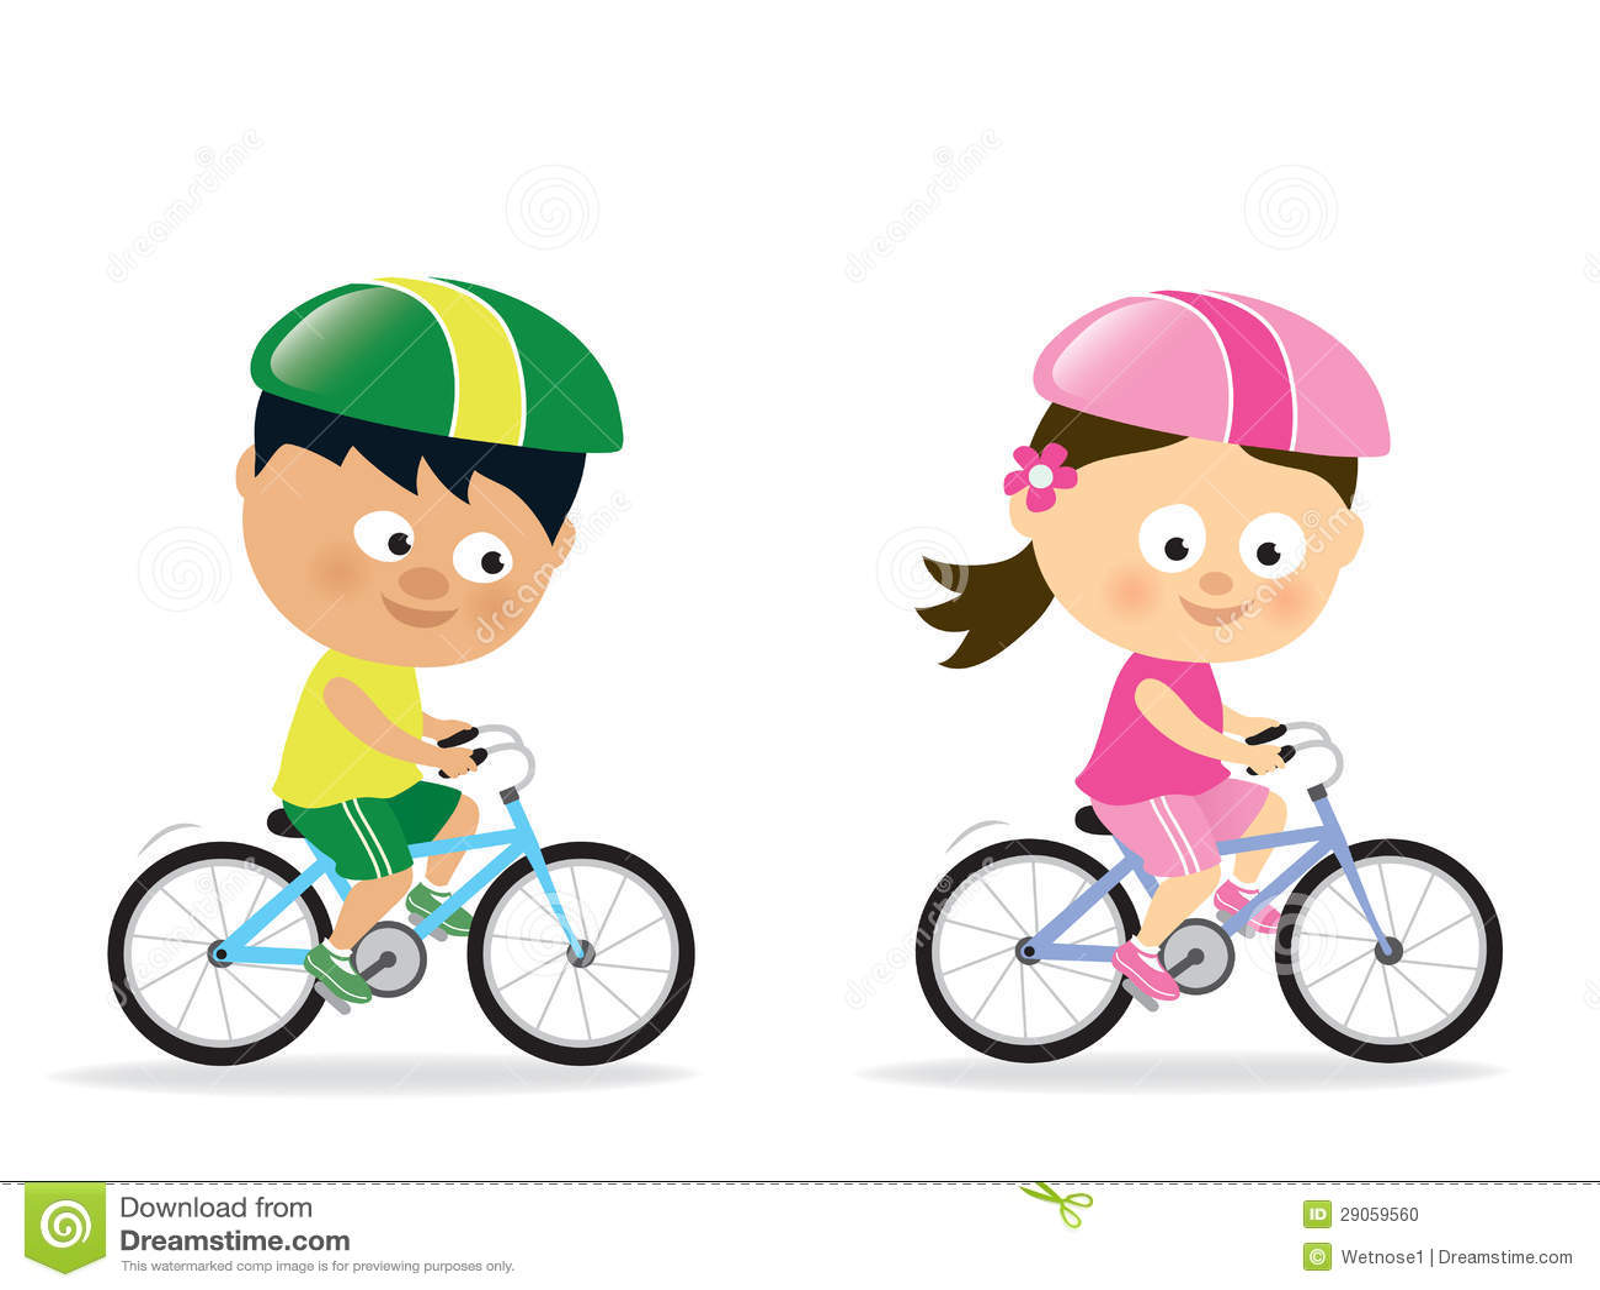 Girl and boy biking stock vector. Illustration of bikes ...